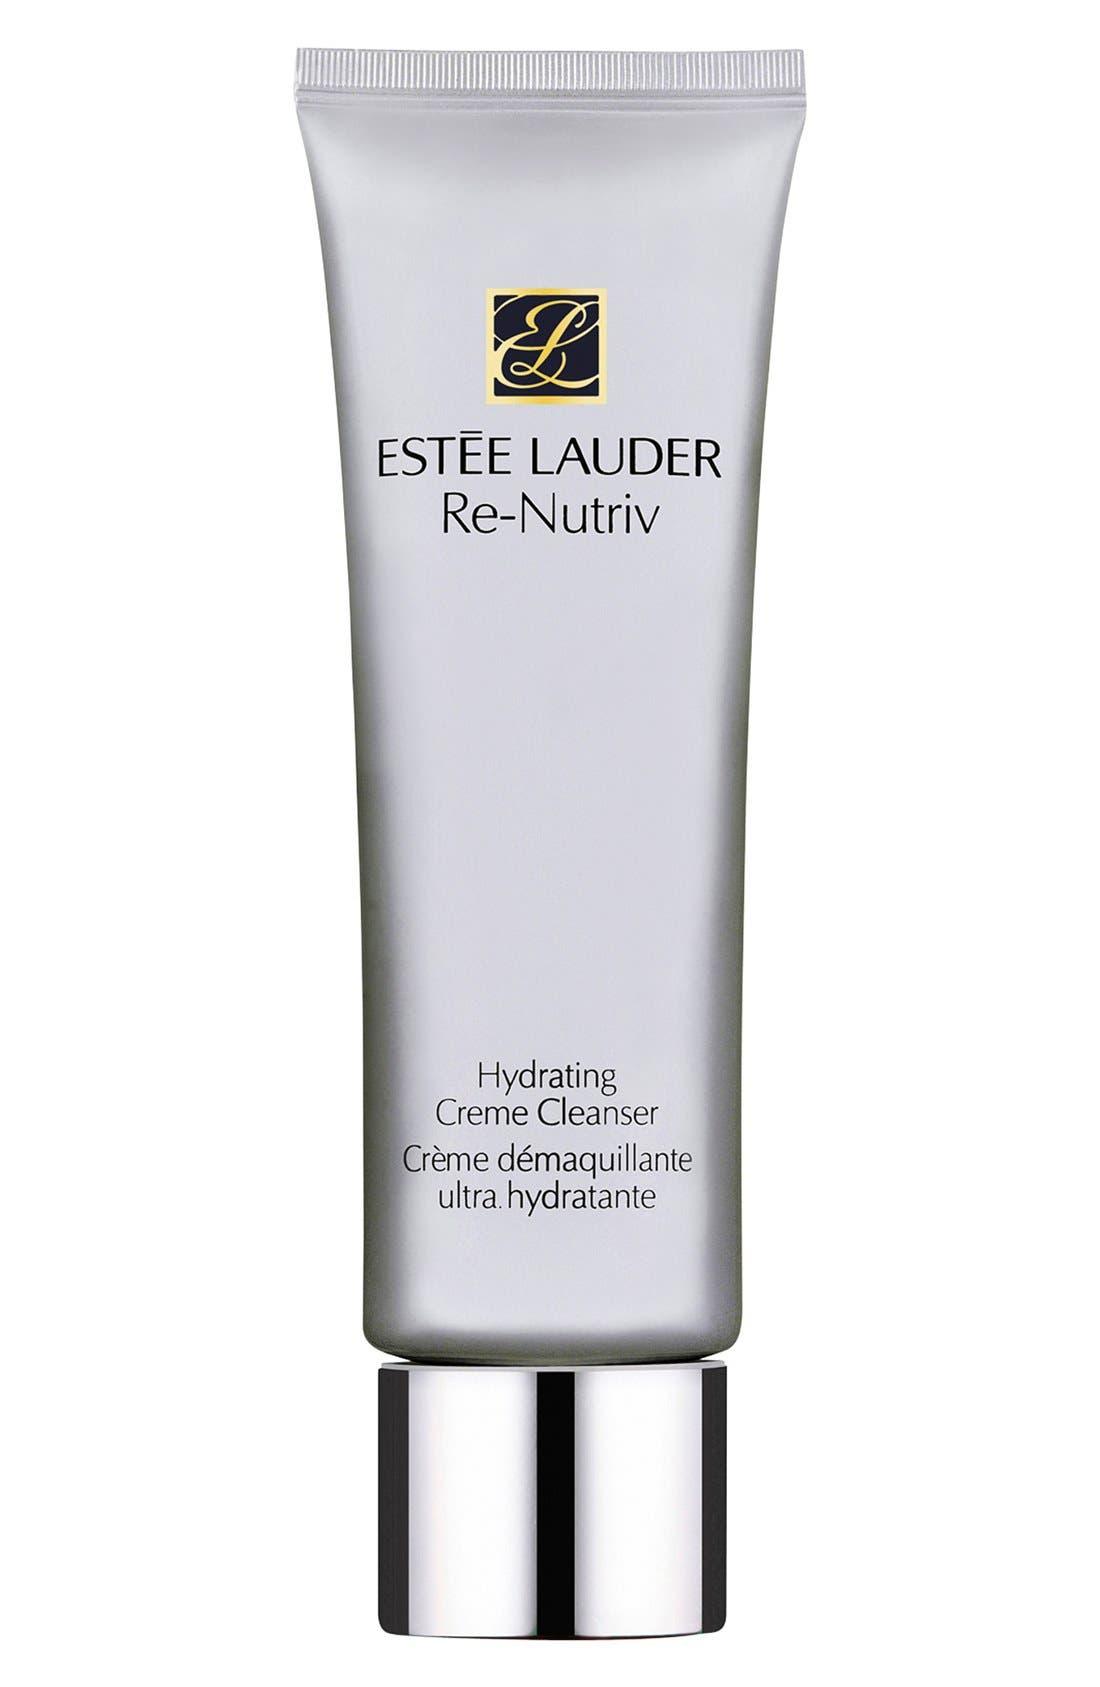 Estée Lauder Re-Nutriv Hydrating Creme Cleanser